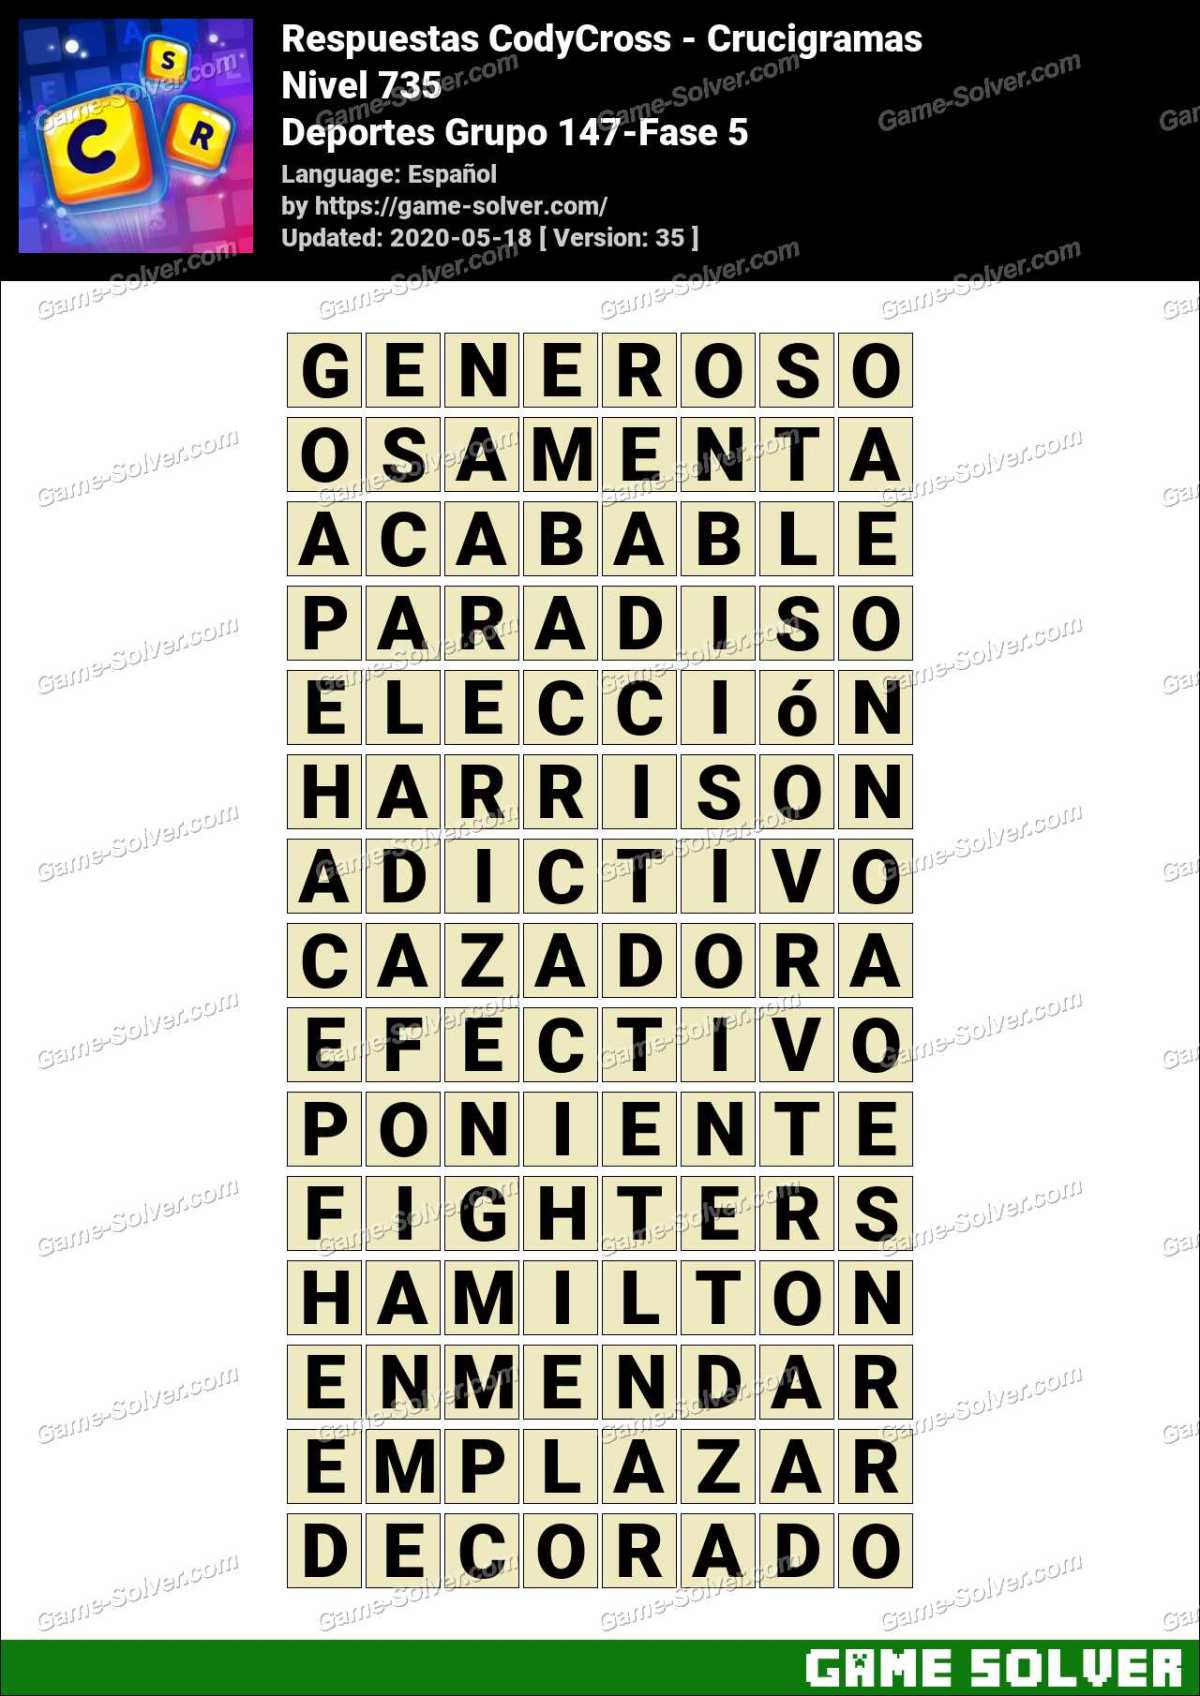 Respuestas CodyCross Deportes Grupo 147-Fase 5